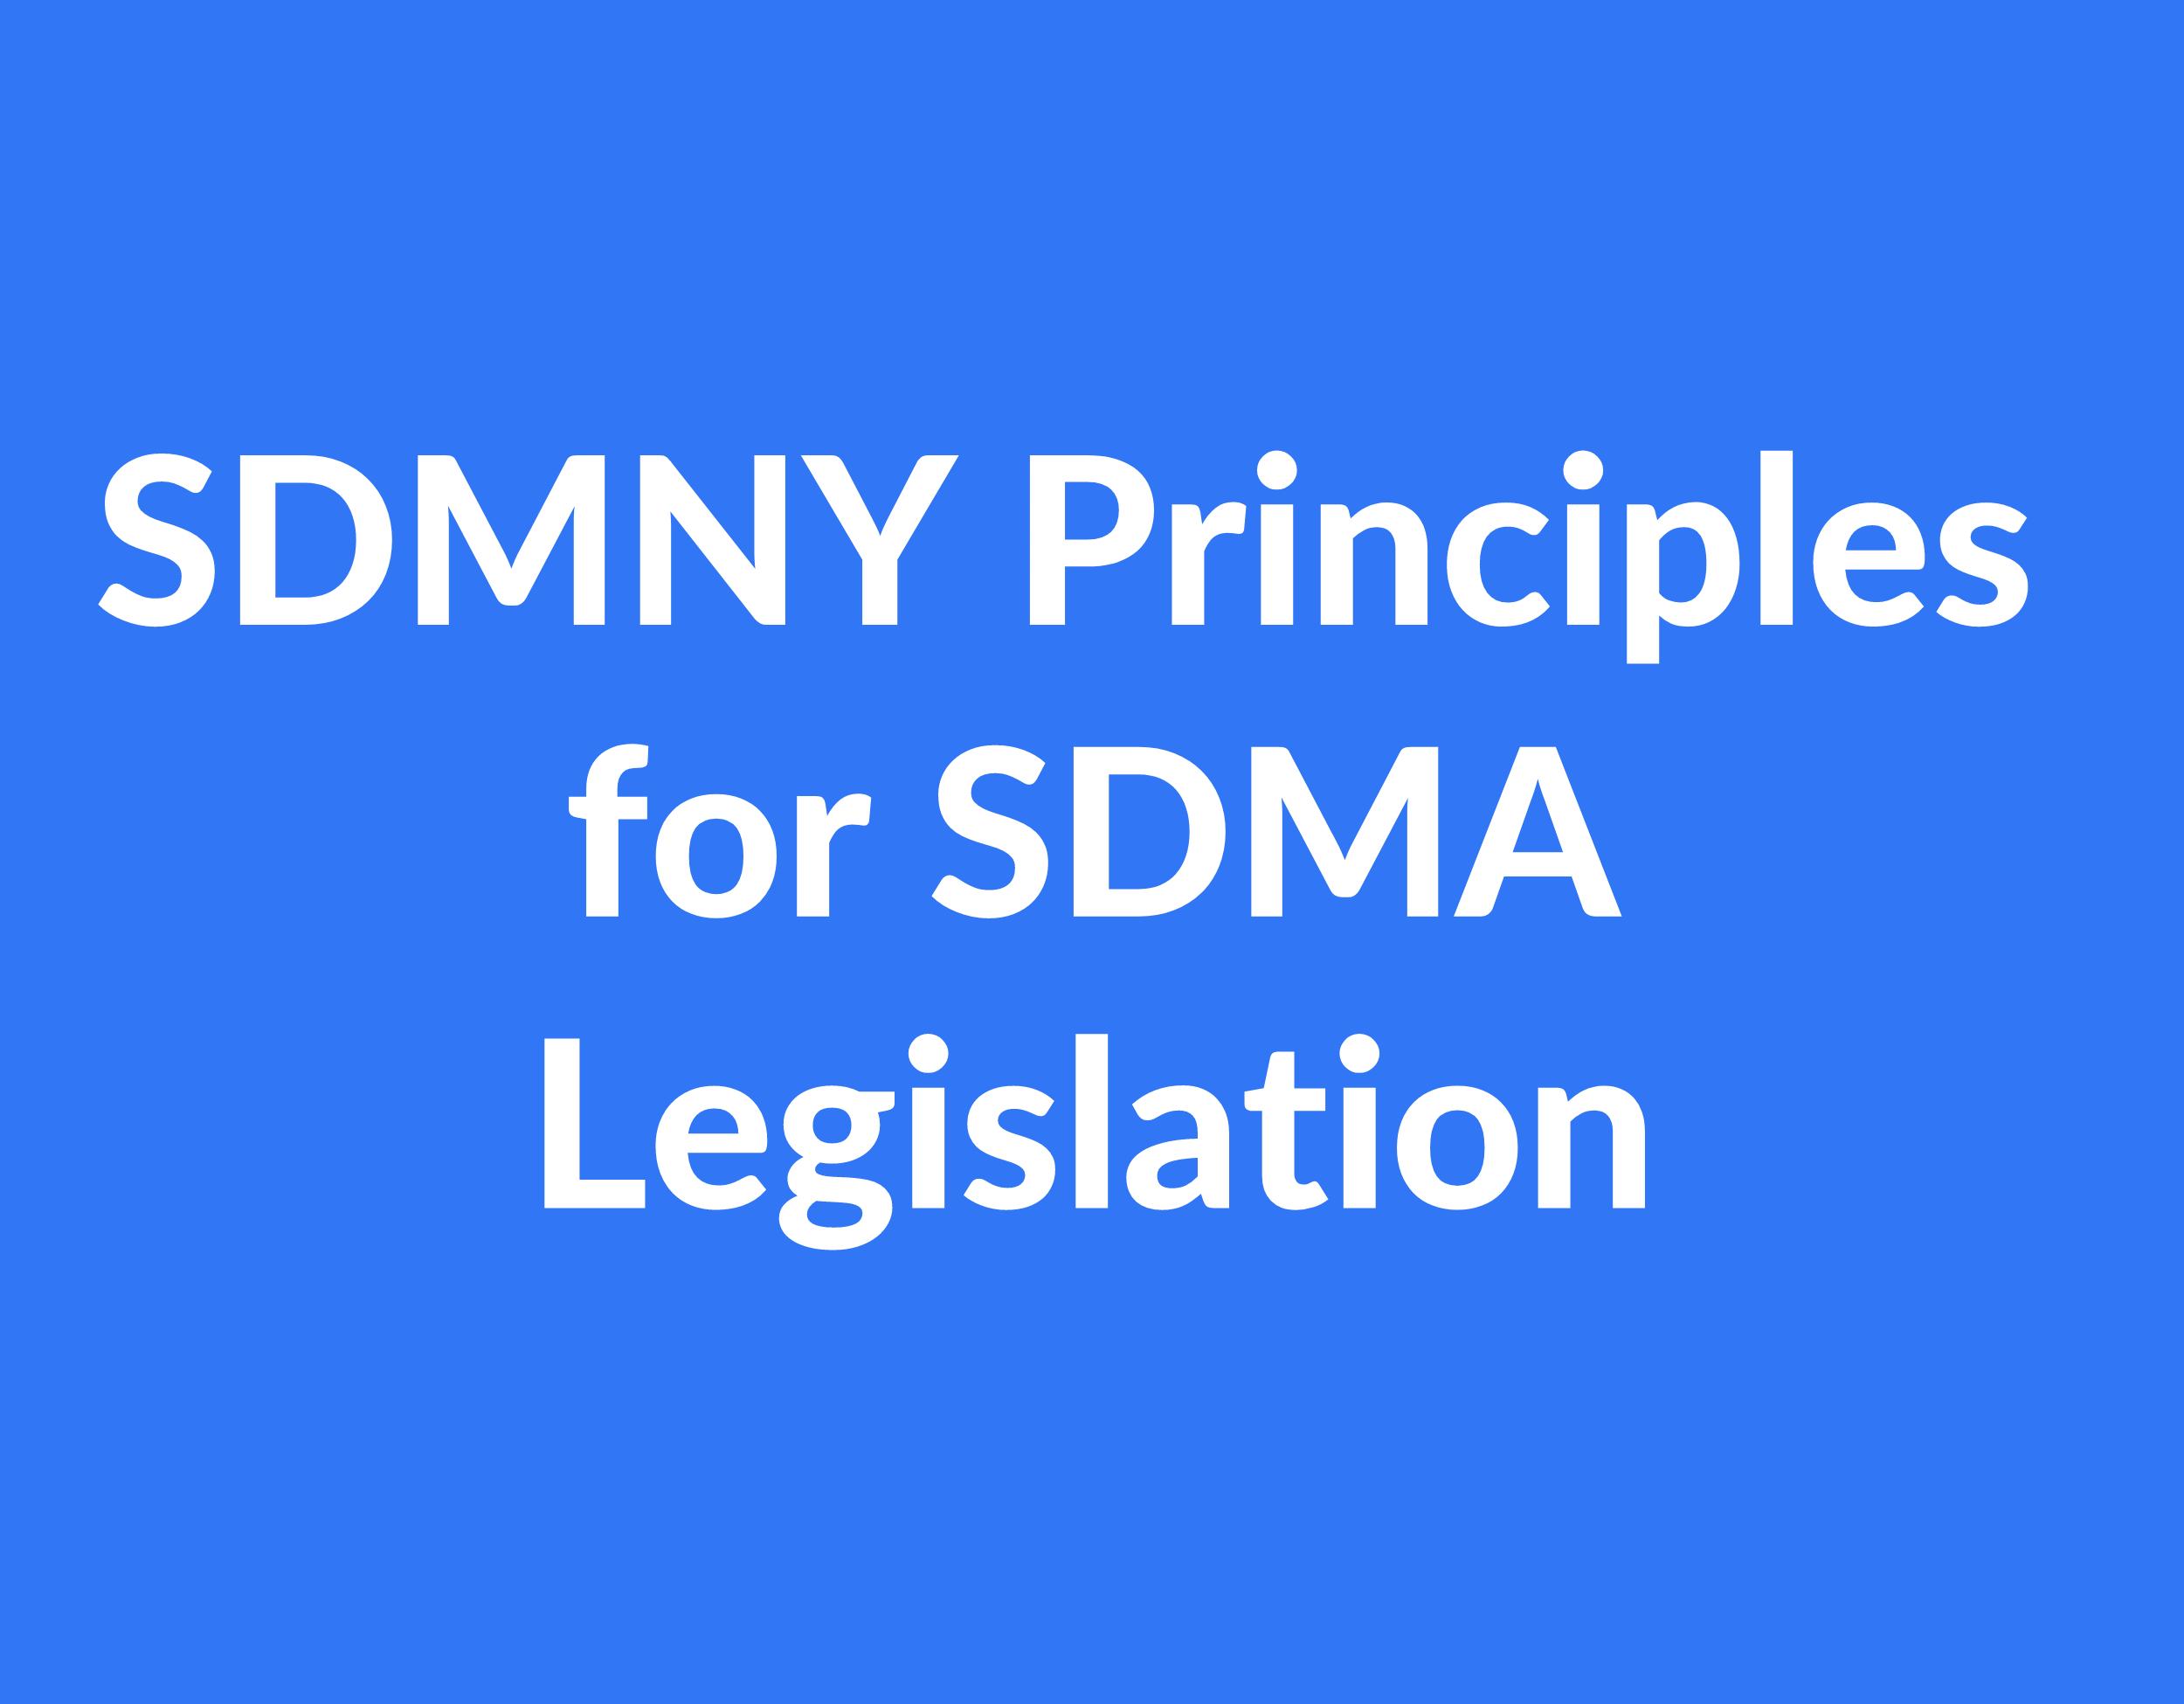 SDMNY Principles for an SDMA Law